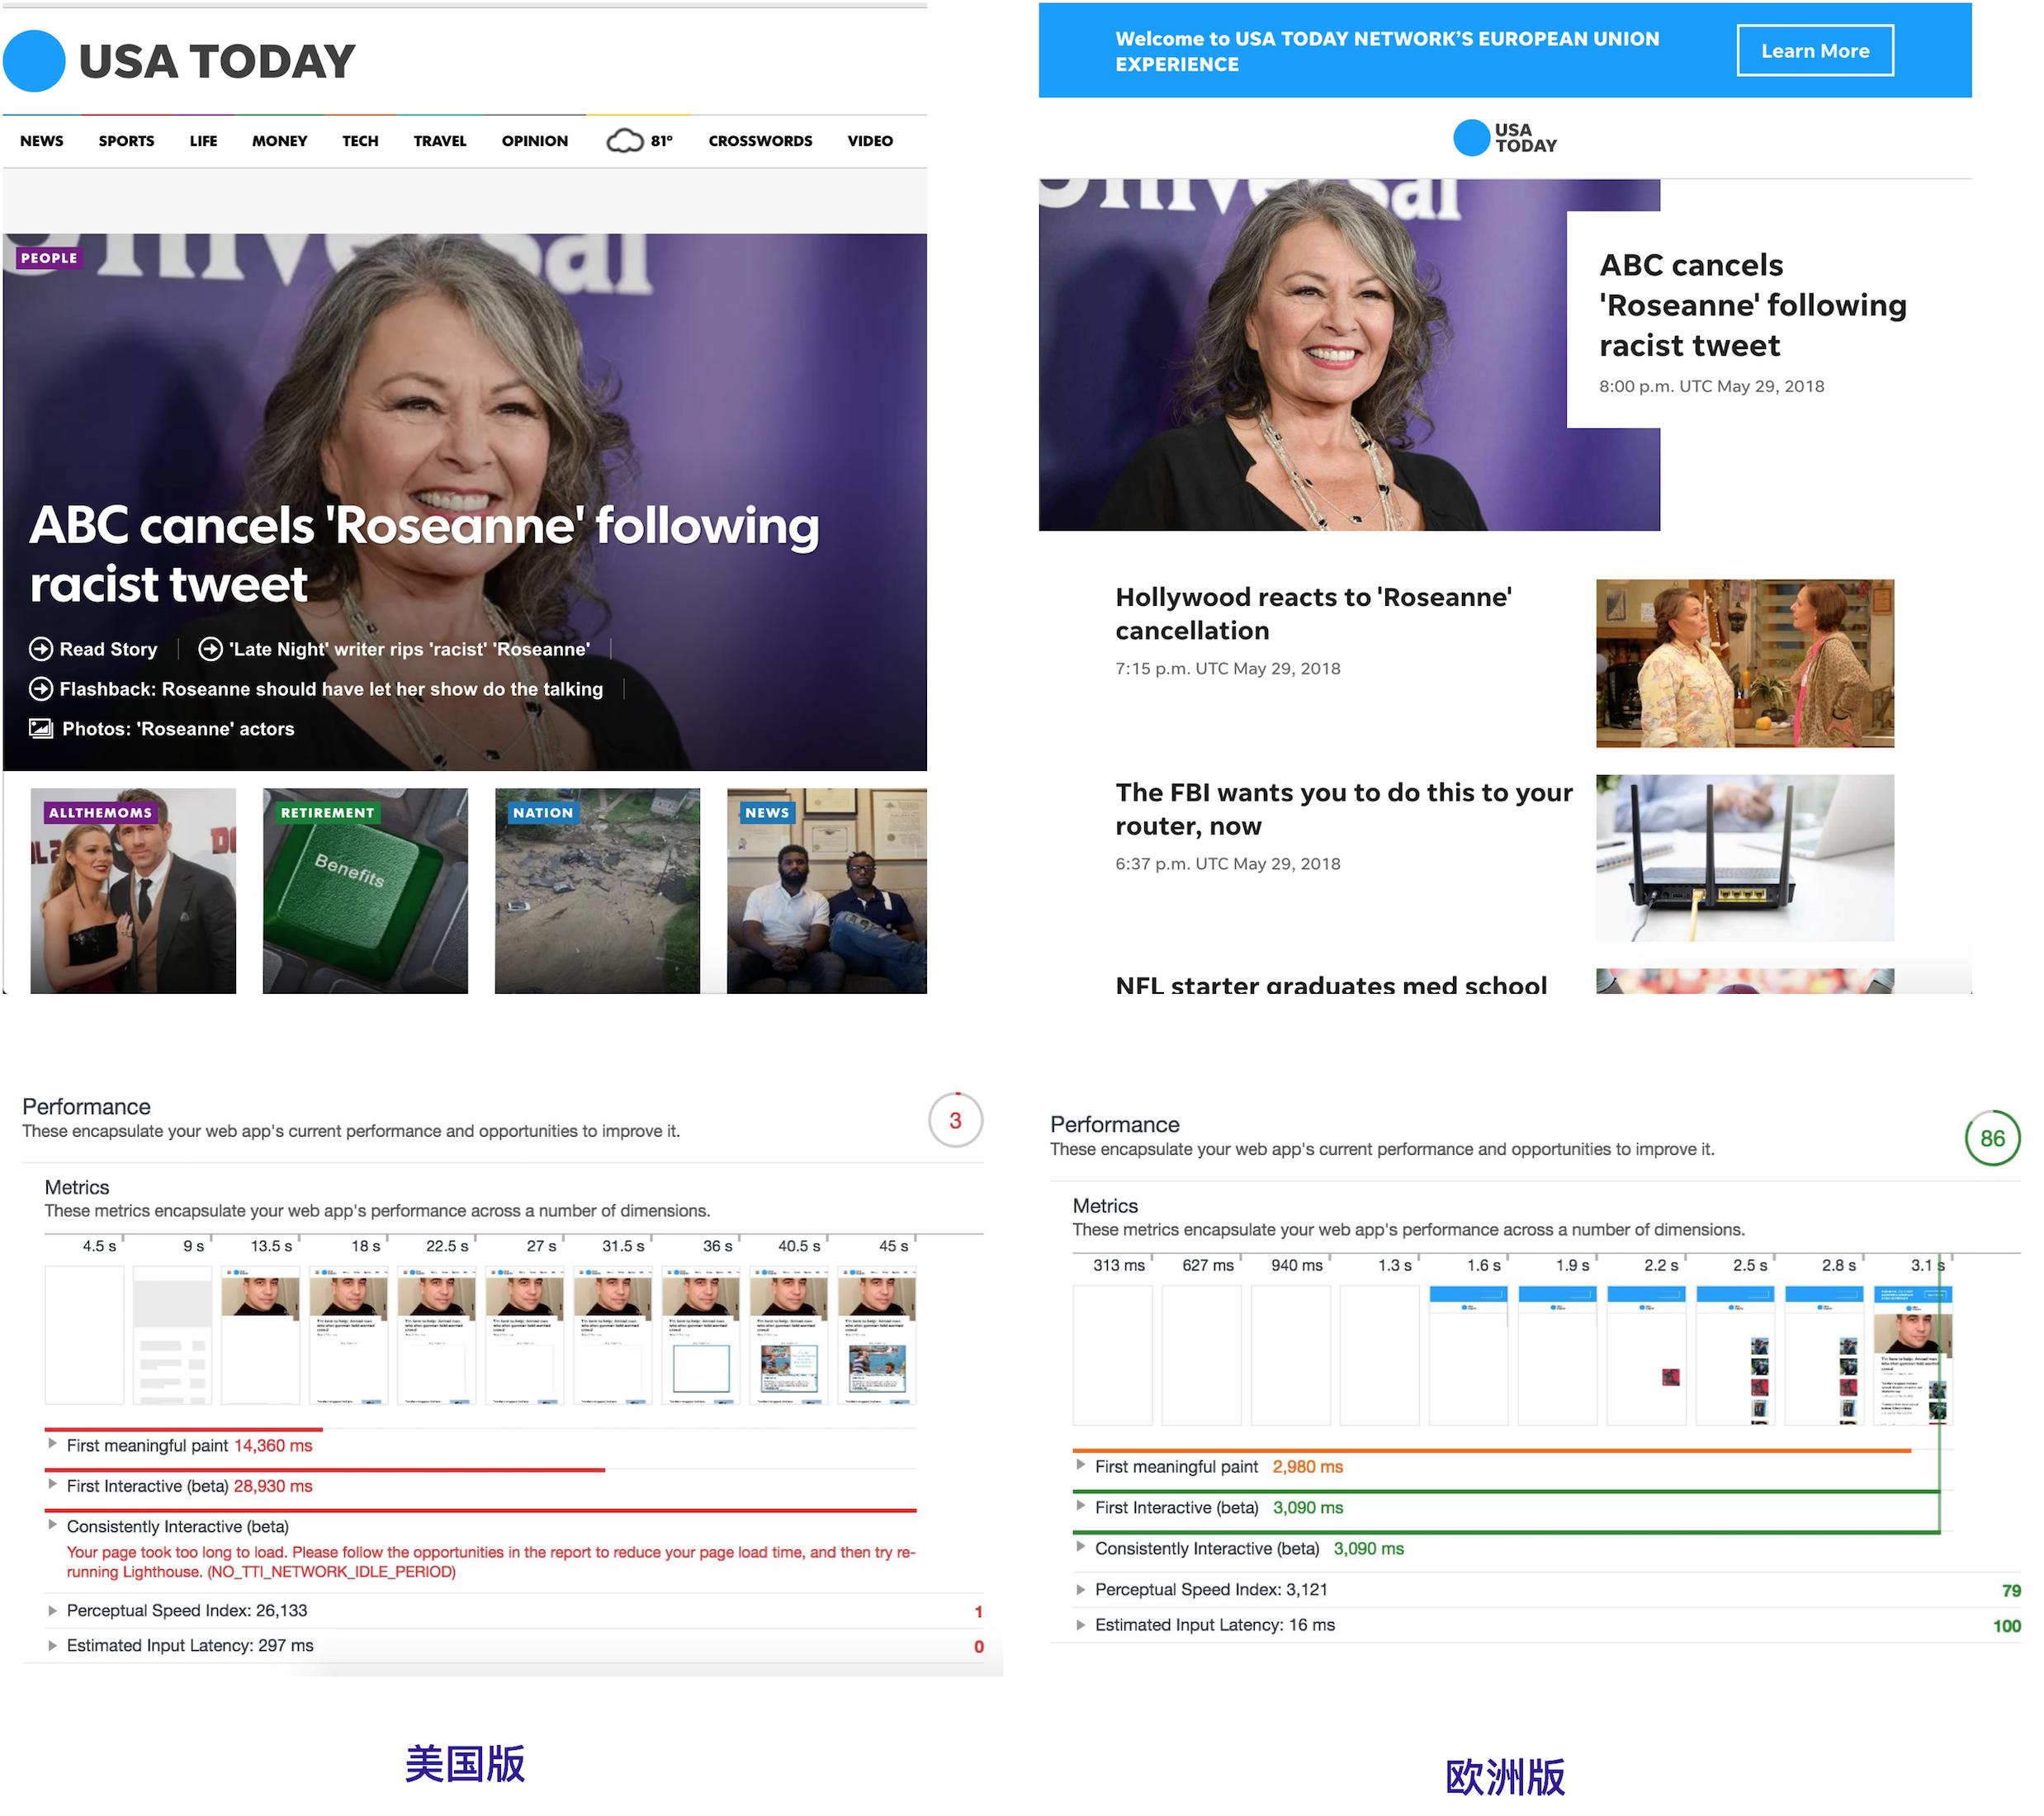 USA Today 美国版与欧洲版的对比